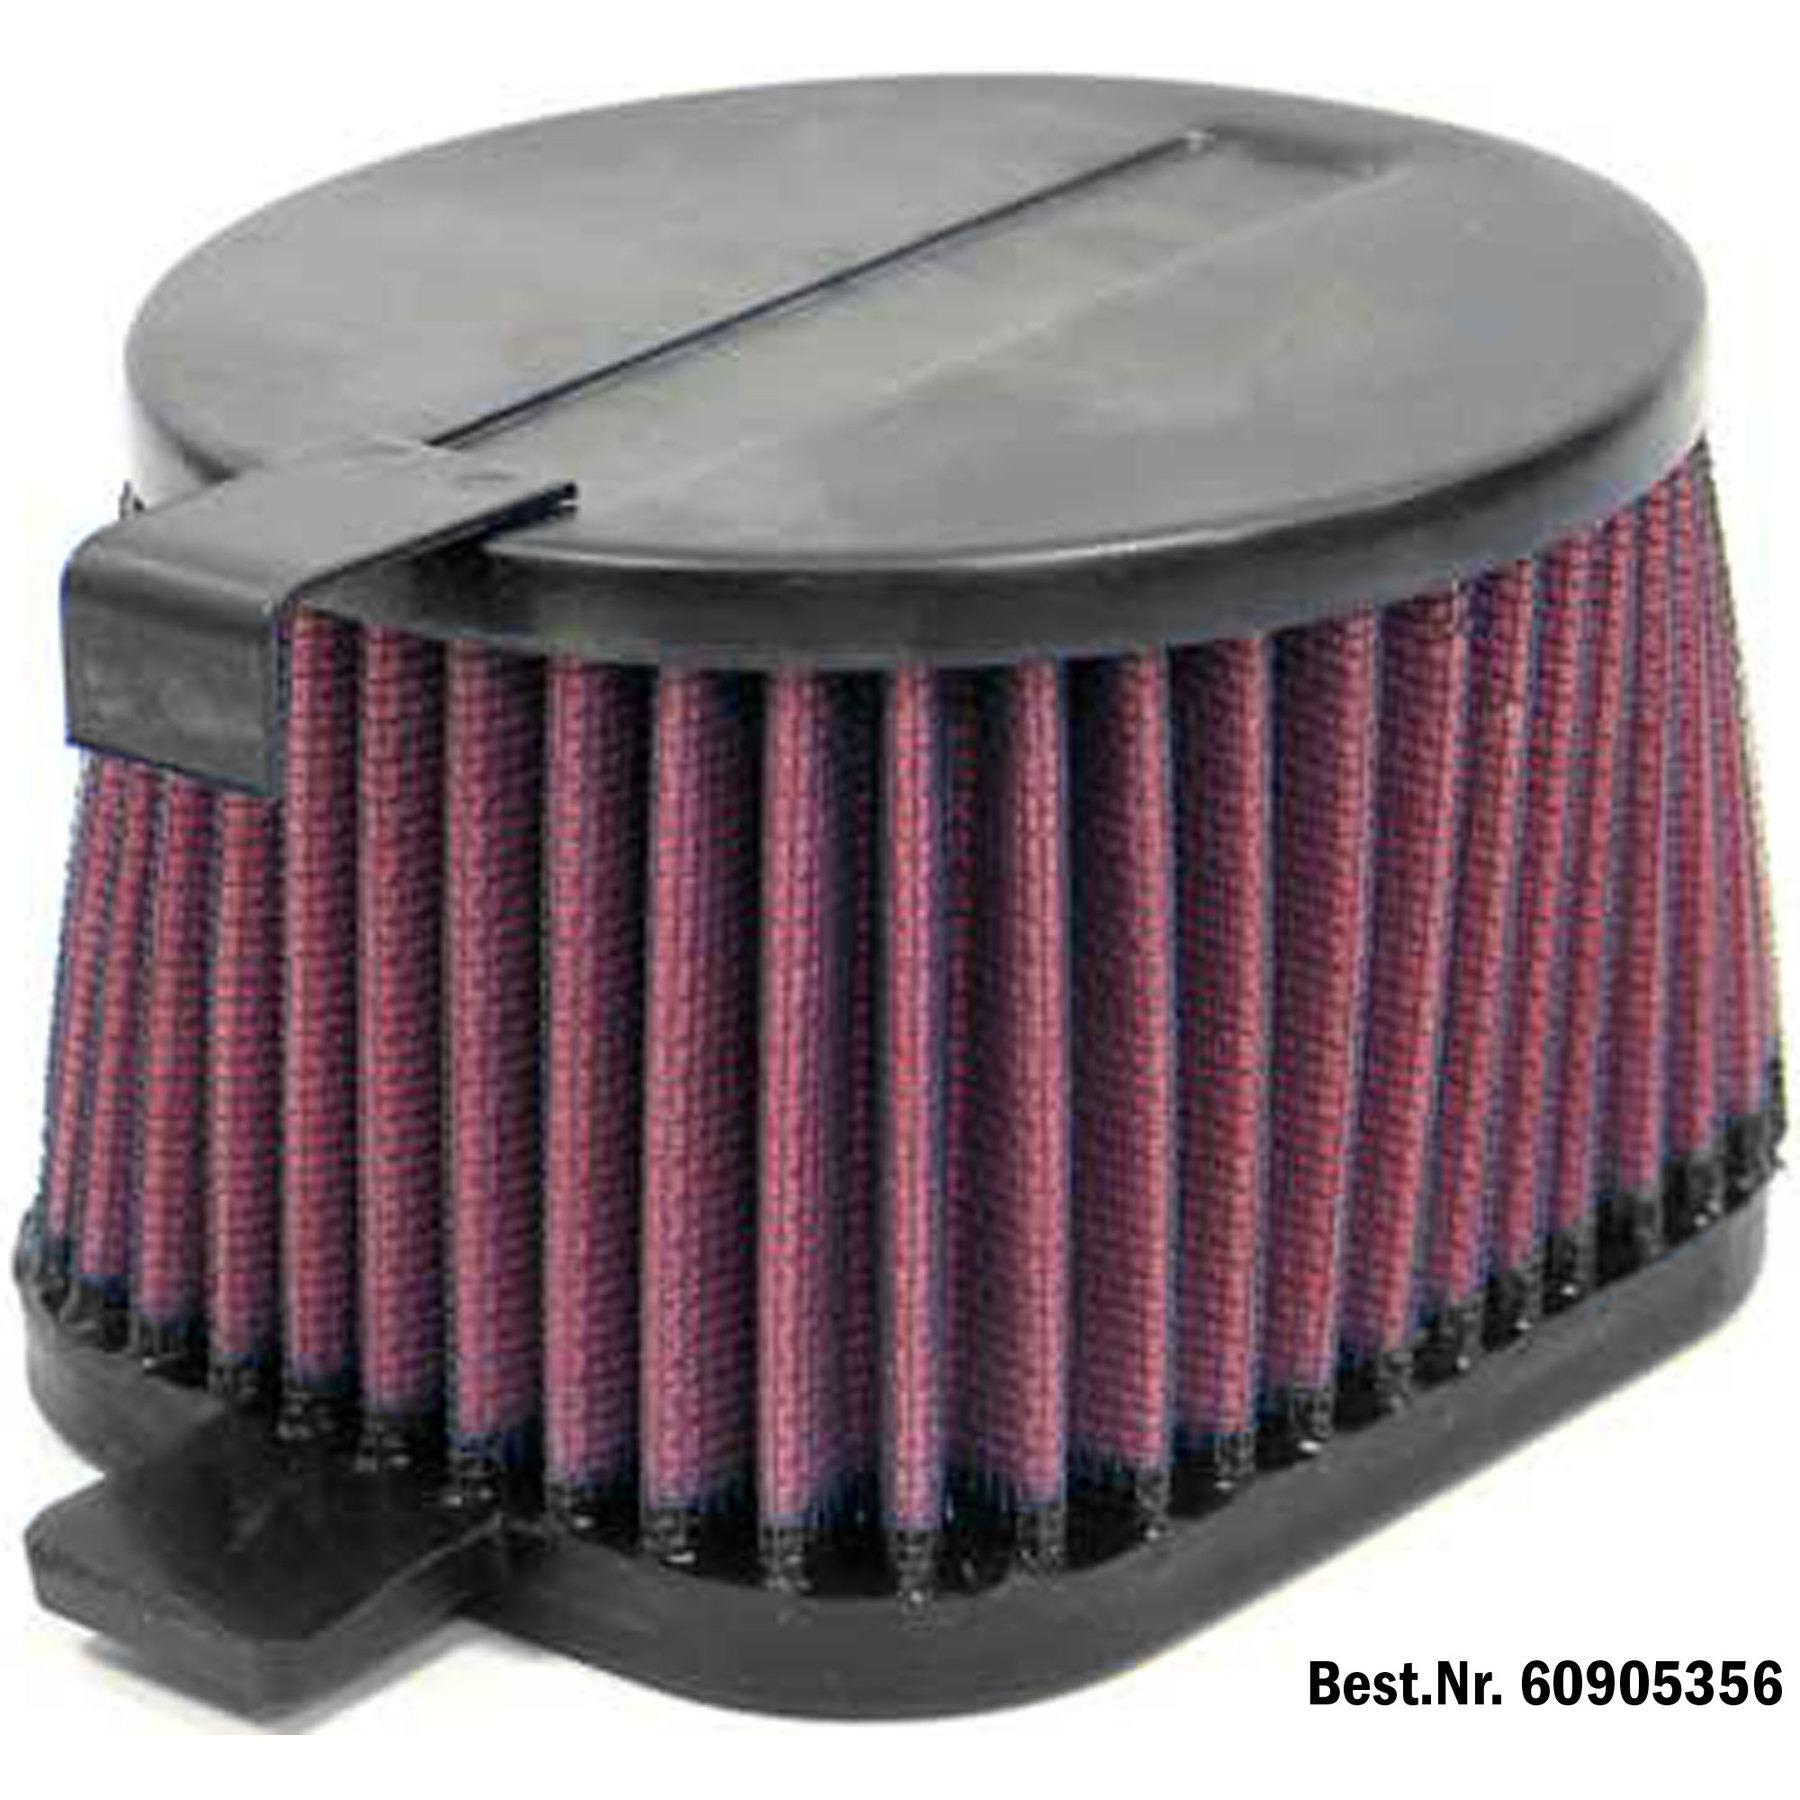 K/&N Oil filter For Honda 1994 CBR900RR-R Fireblade